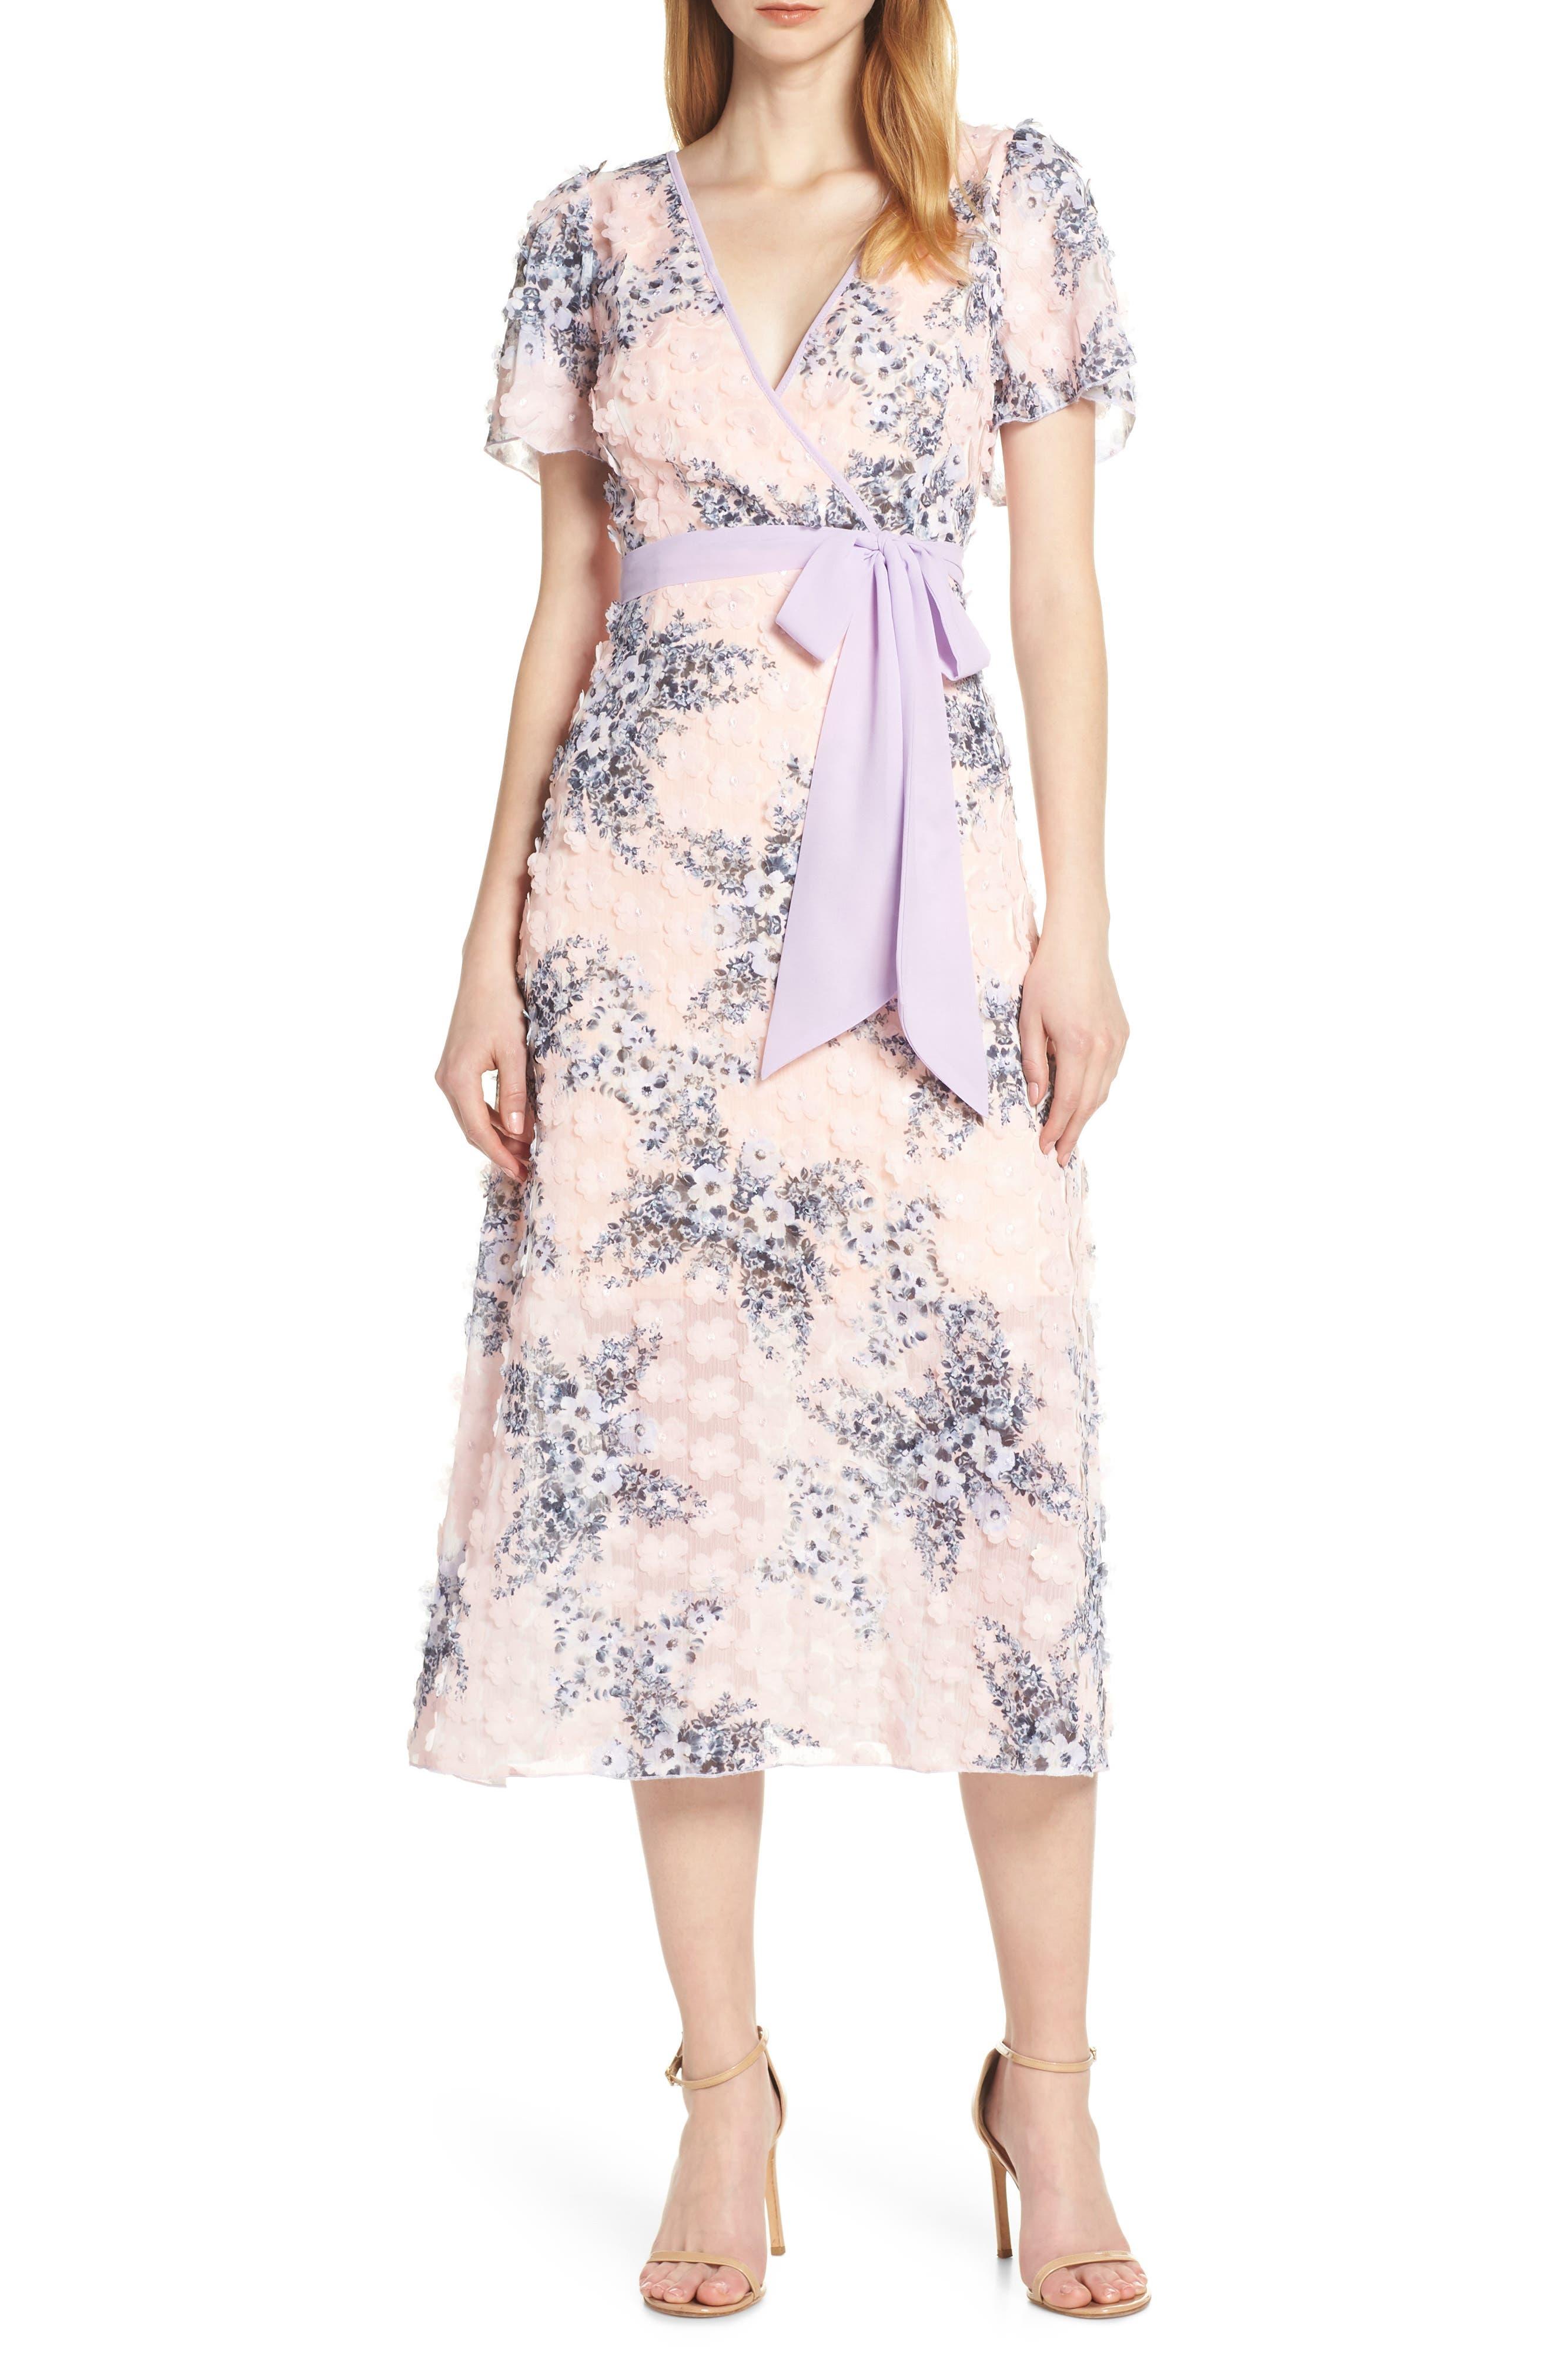 Foxiedox Naima 3D Floral Tea Length Dress, Pink